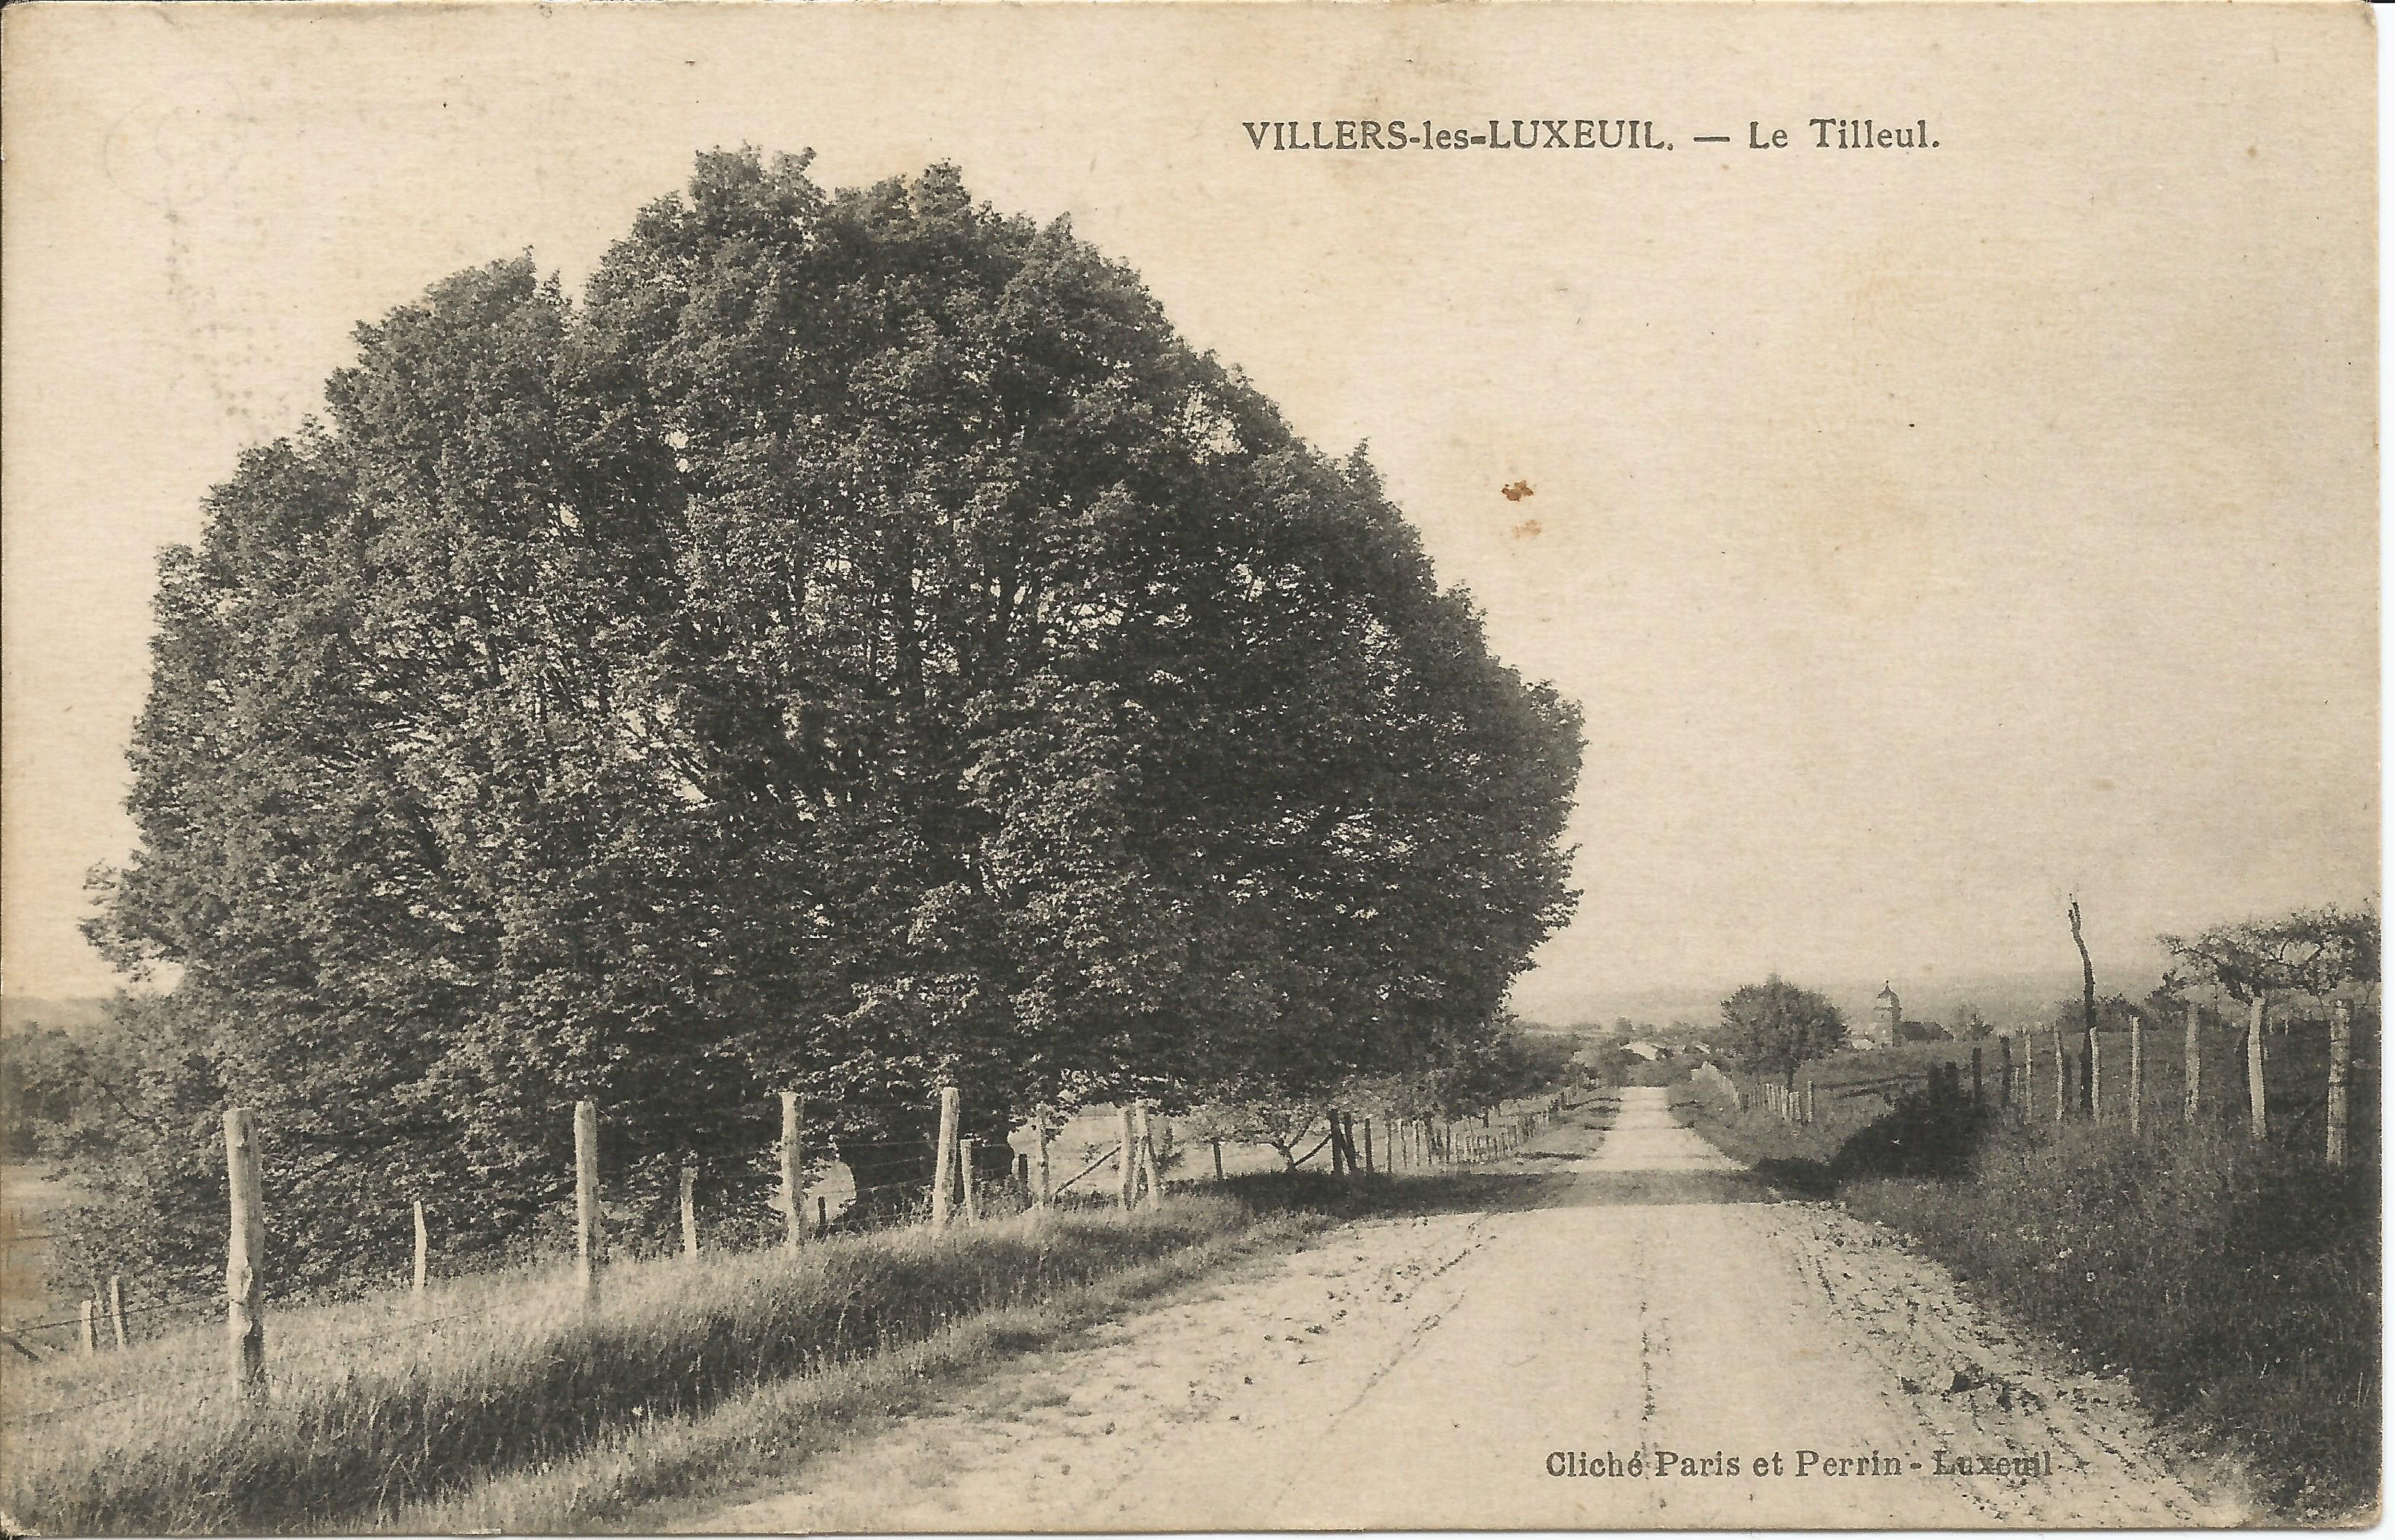 https://www.villers-les-luxeuil.com/projets/villers/files/images/Cartes_postales/Tilleul_2015/Le_Tilleul_5.jpg